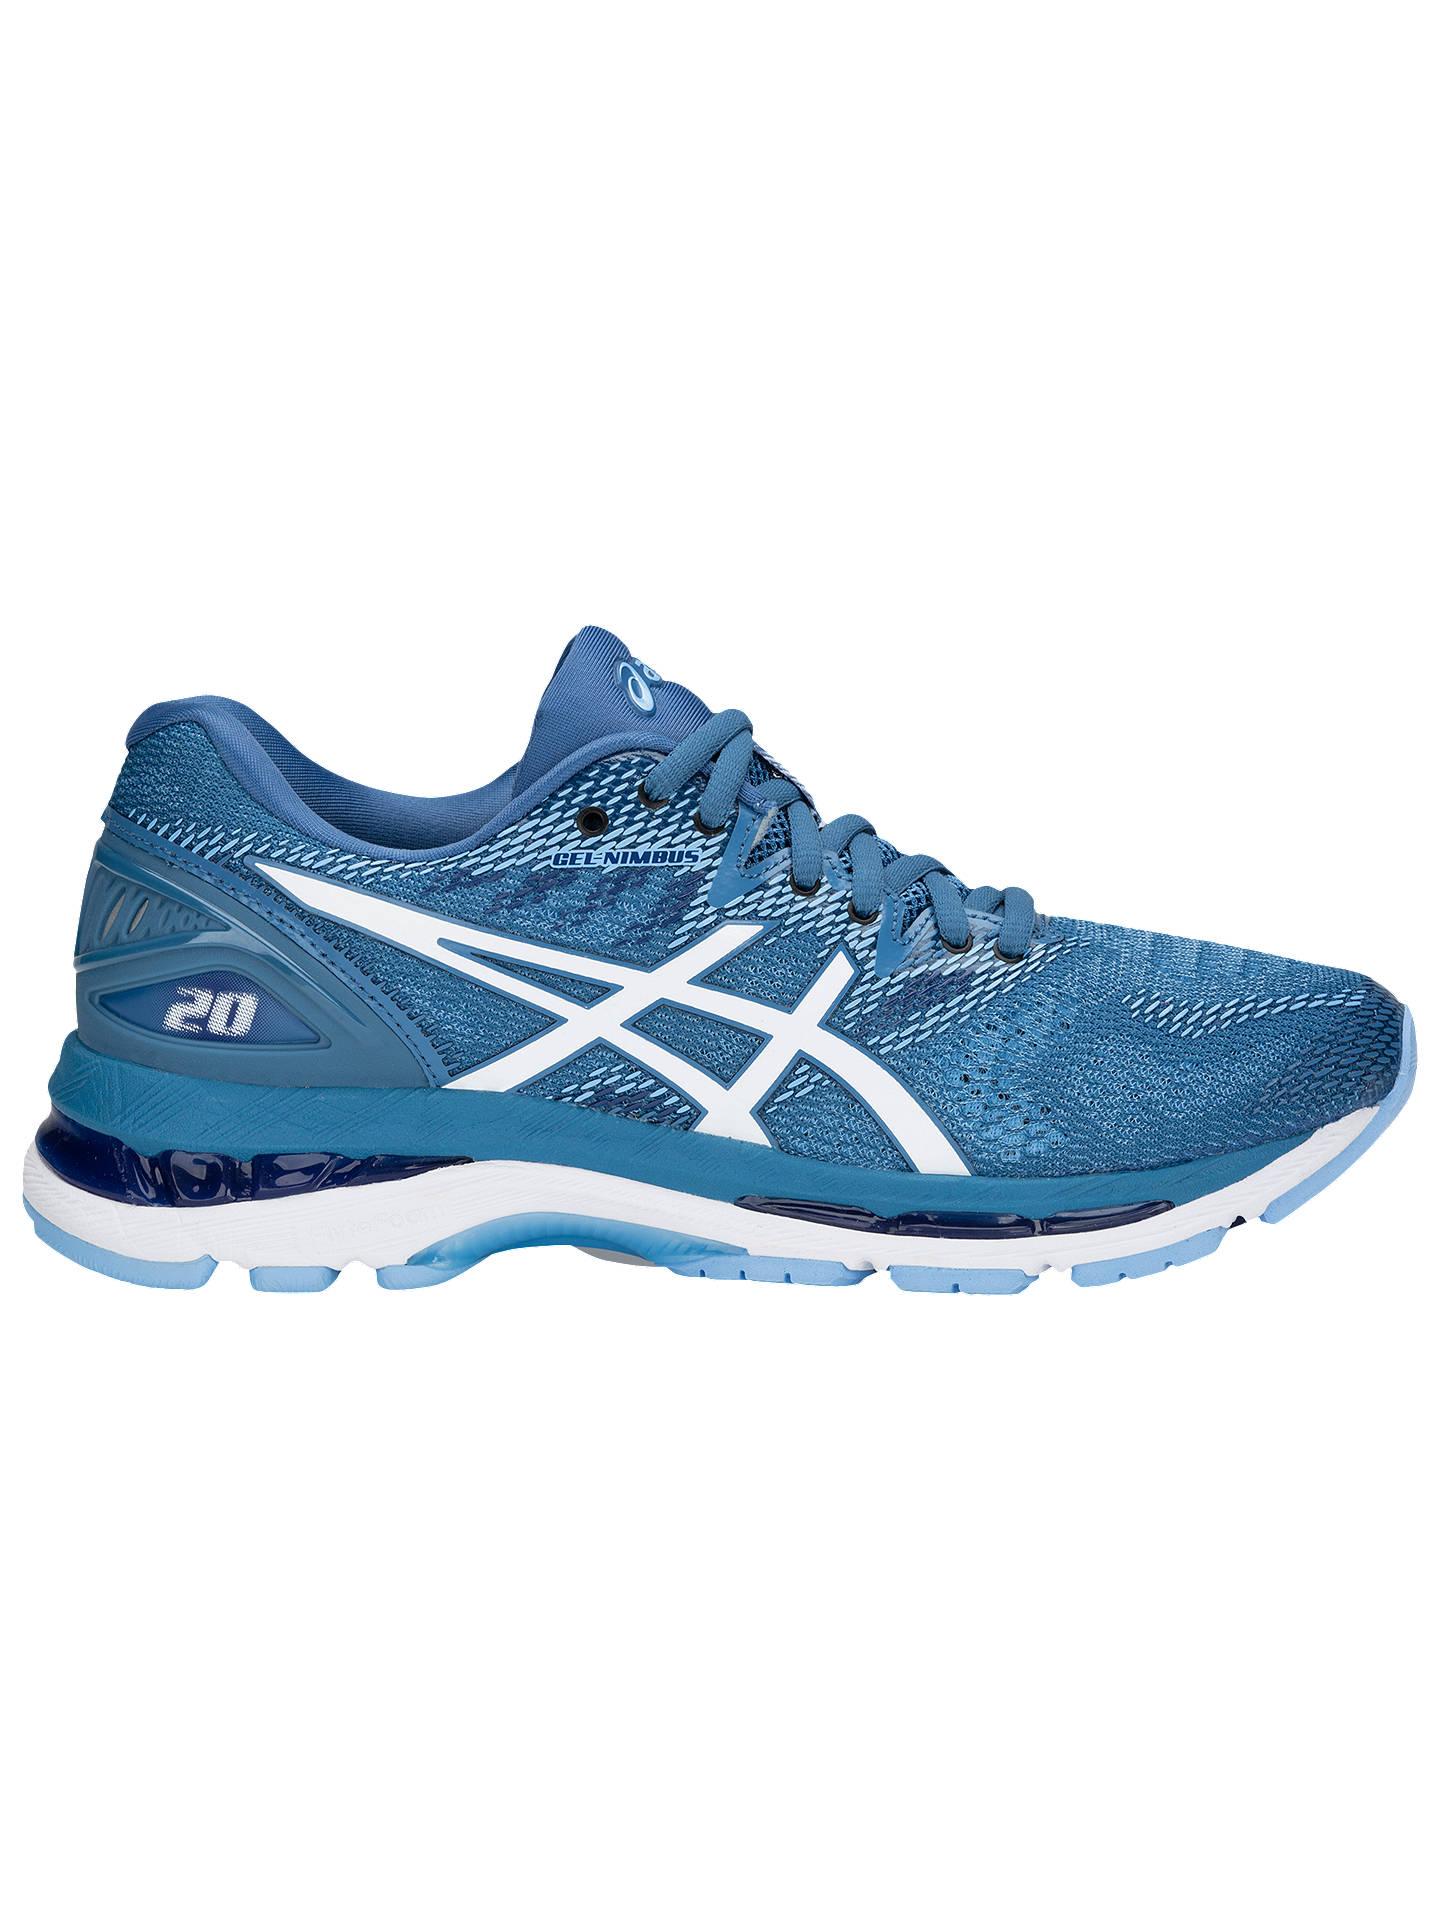 58a46c45c03 ASICS GEL-NIMBUS 20 Women s Running Shoes at John Lewis   Partners